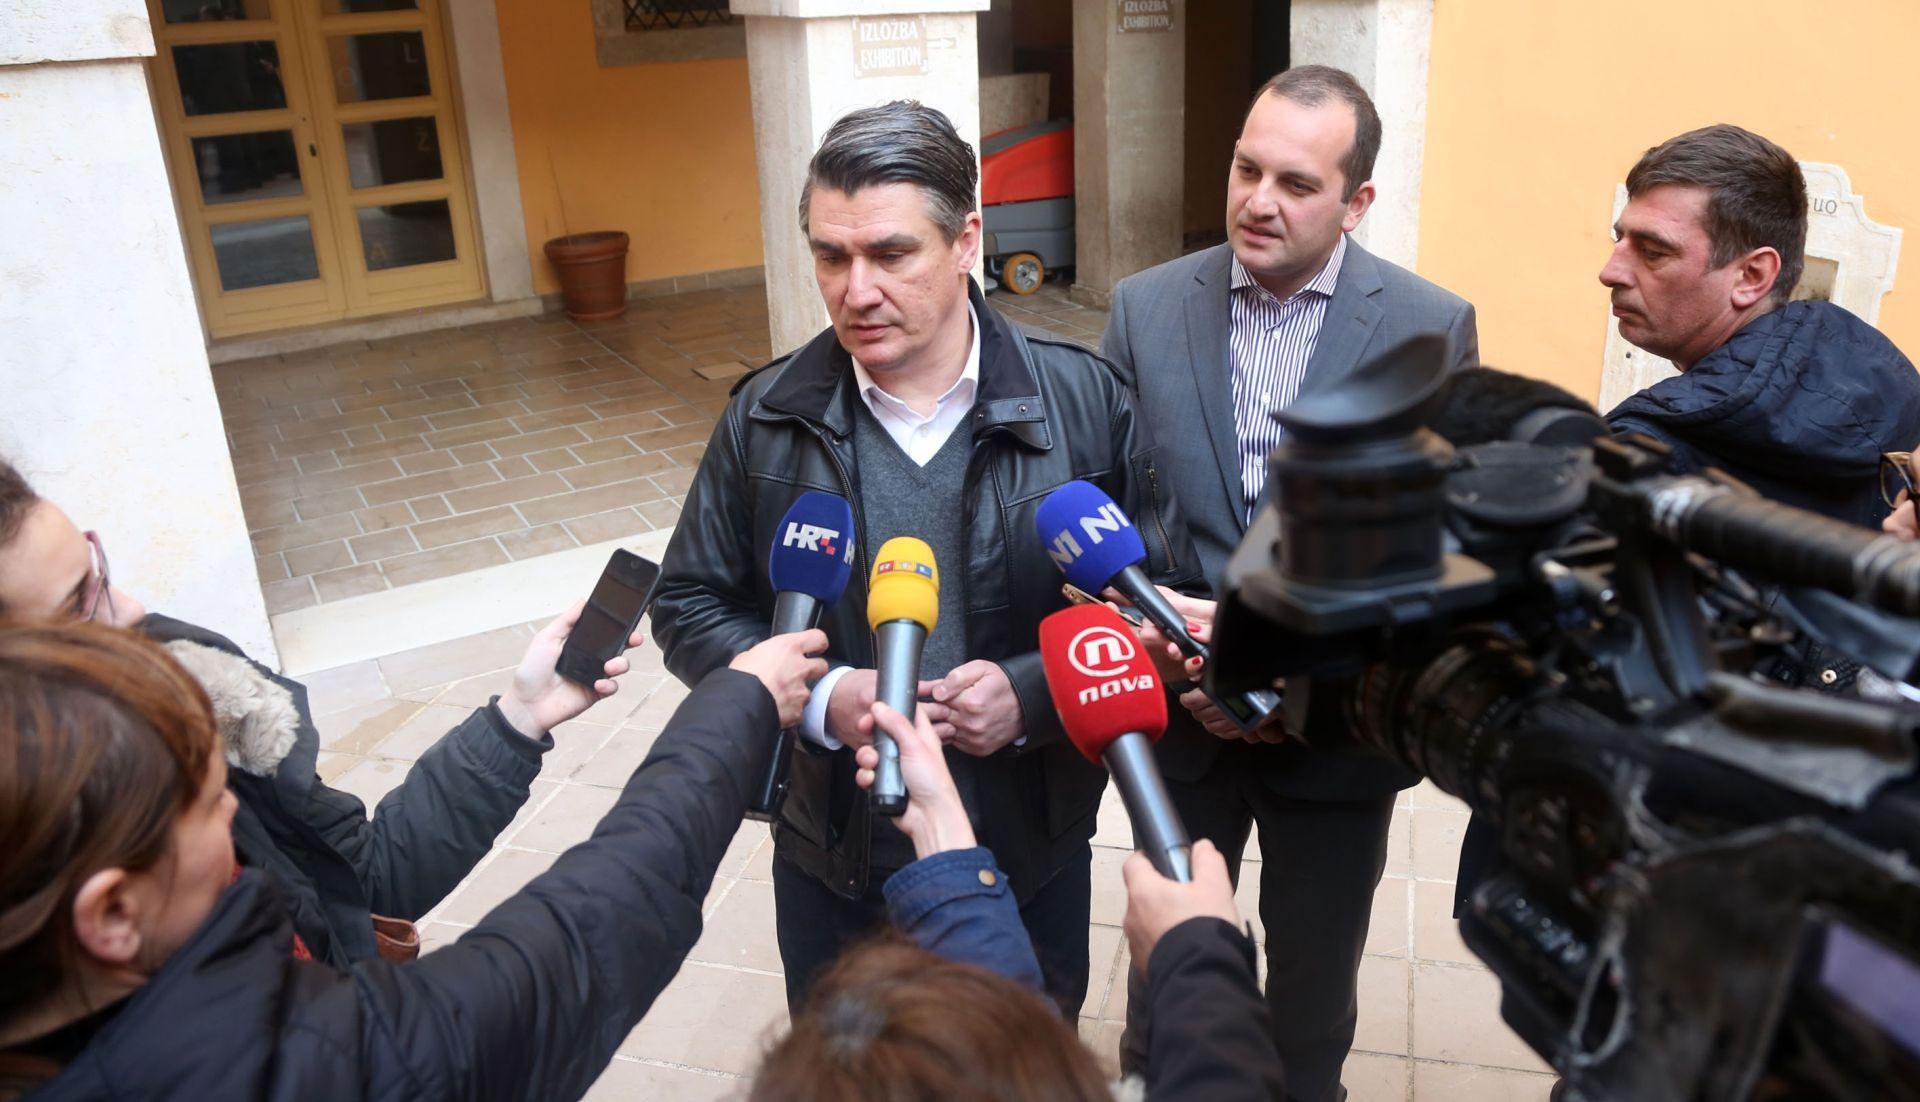 Zoran Milanović: Mislim da HRT radi za HDZ, često radi poluprofesionalno, ali to ne znači da bih tamo radio čistke